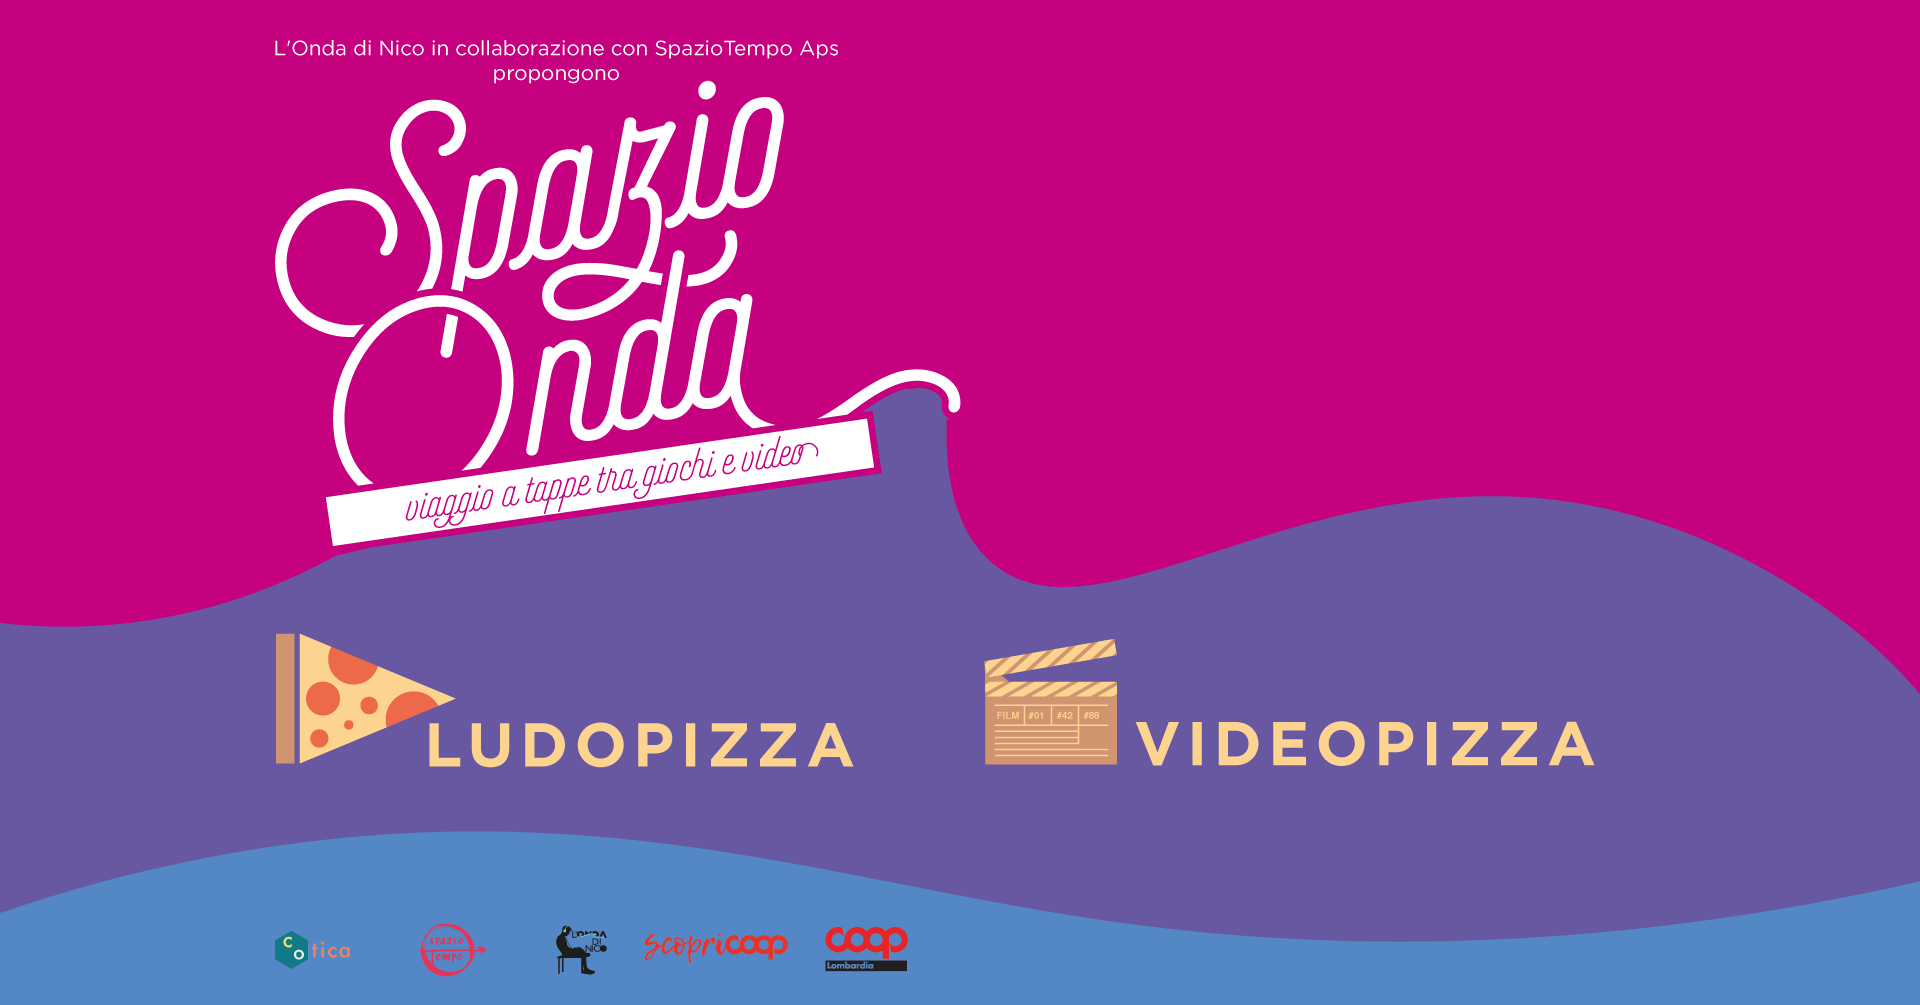 https://www.spaziotempomilano.it/wp-content/uploads/2020/10/FB-SpazioOnda.png